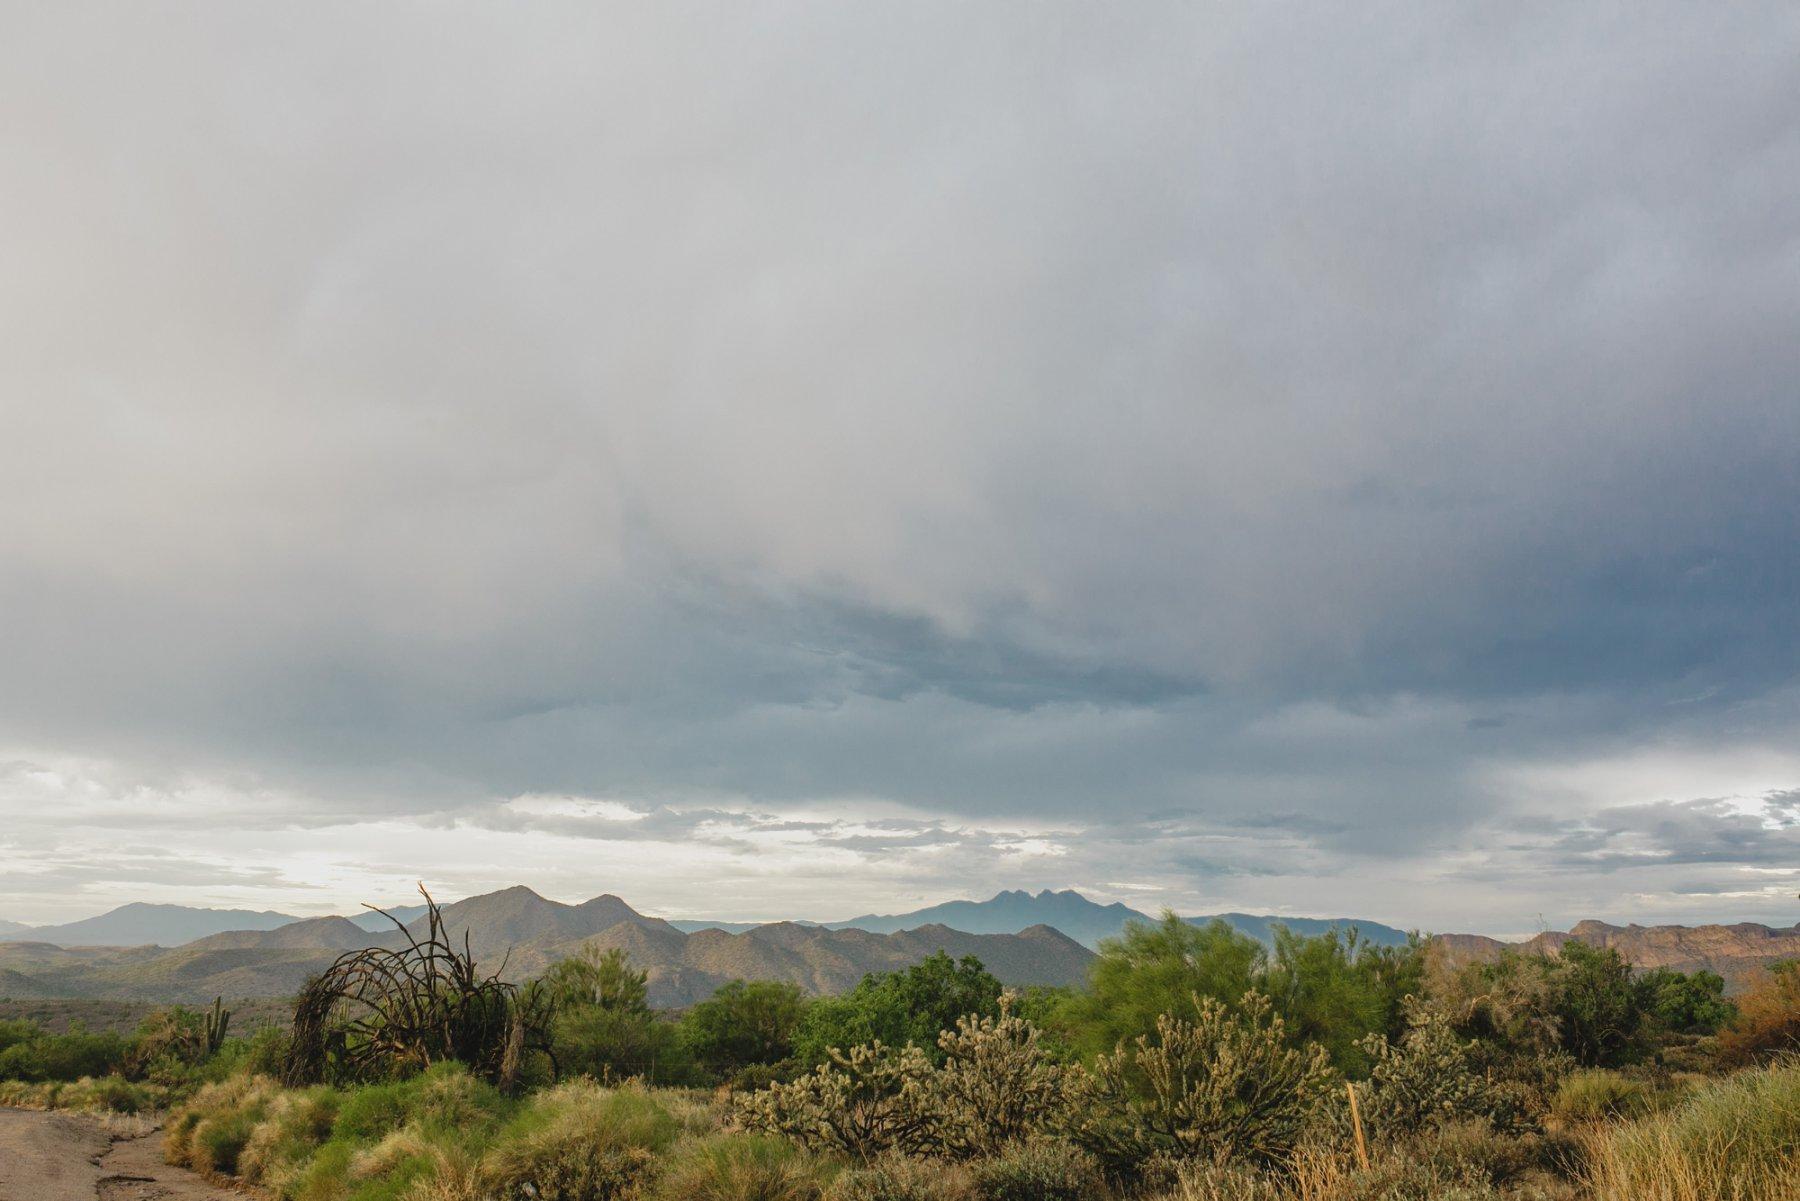 Salt River monsoon storm